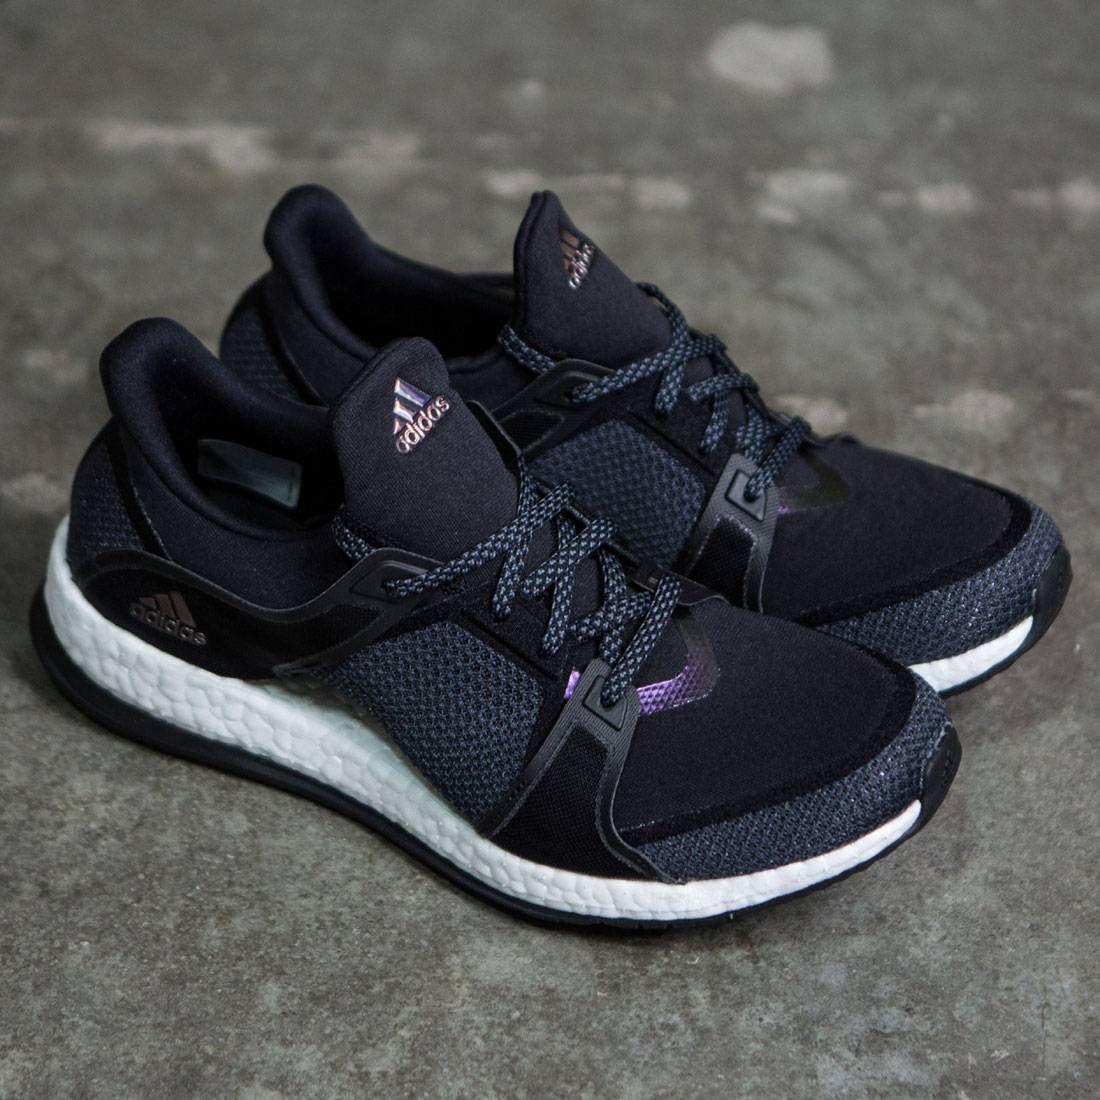 Adidas Women Pure Boost X Training Black Onix Footwear White Adidas Women Shoes Sneakers Adidas Womens Sneakers